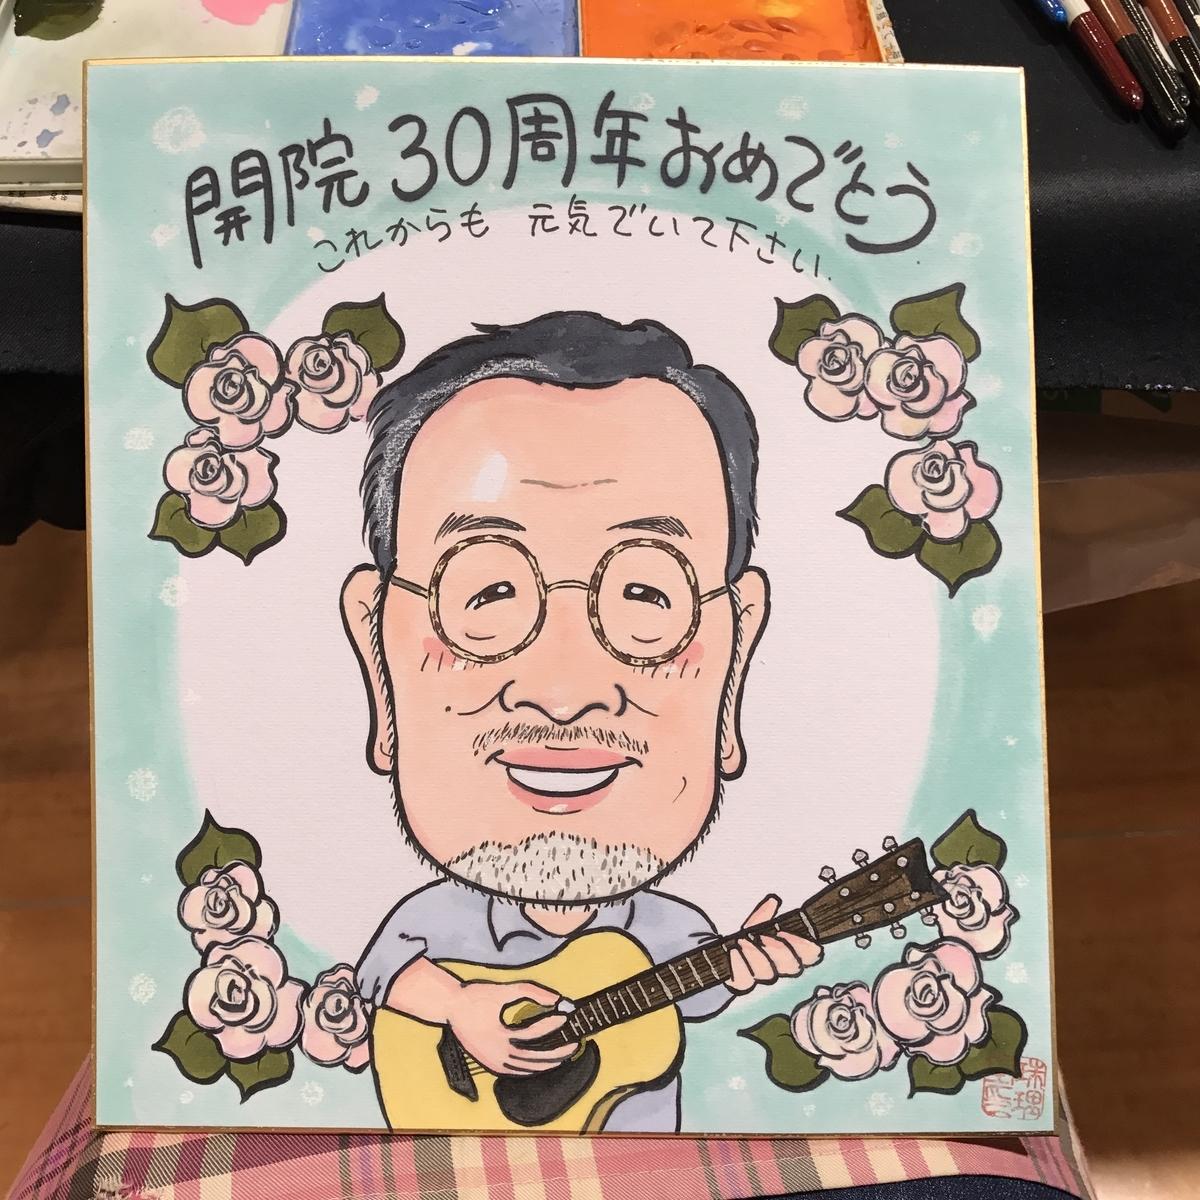 開院30周年記念の似顔絵